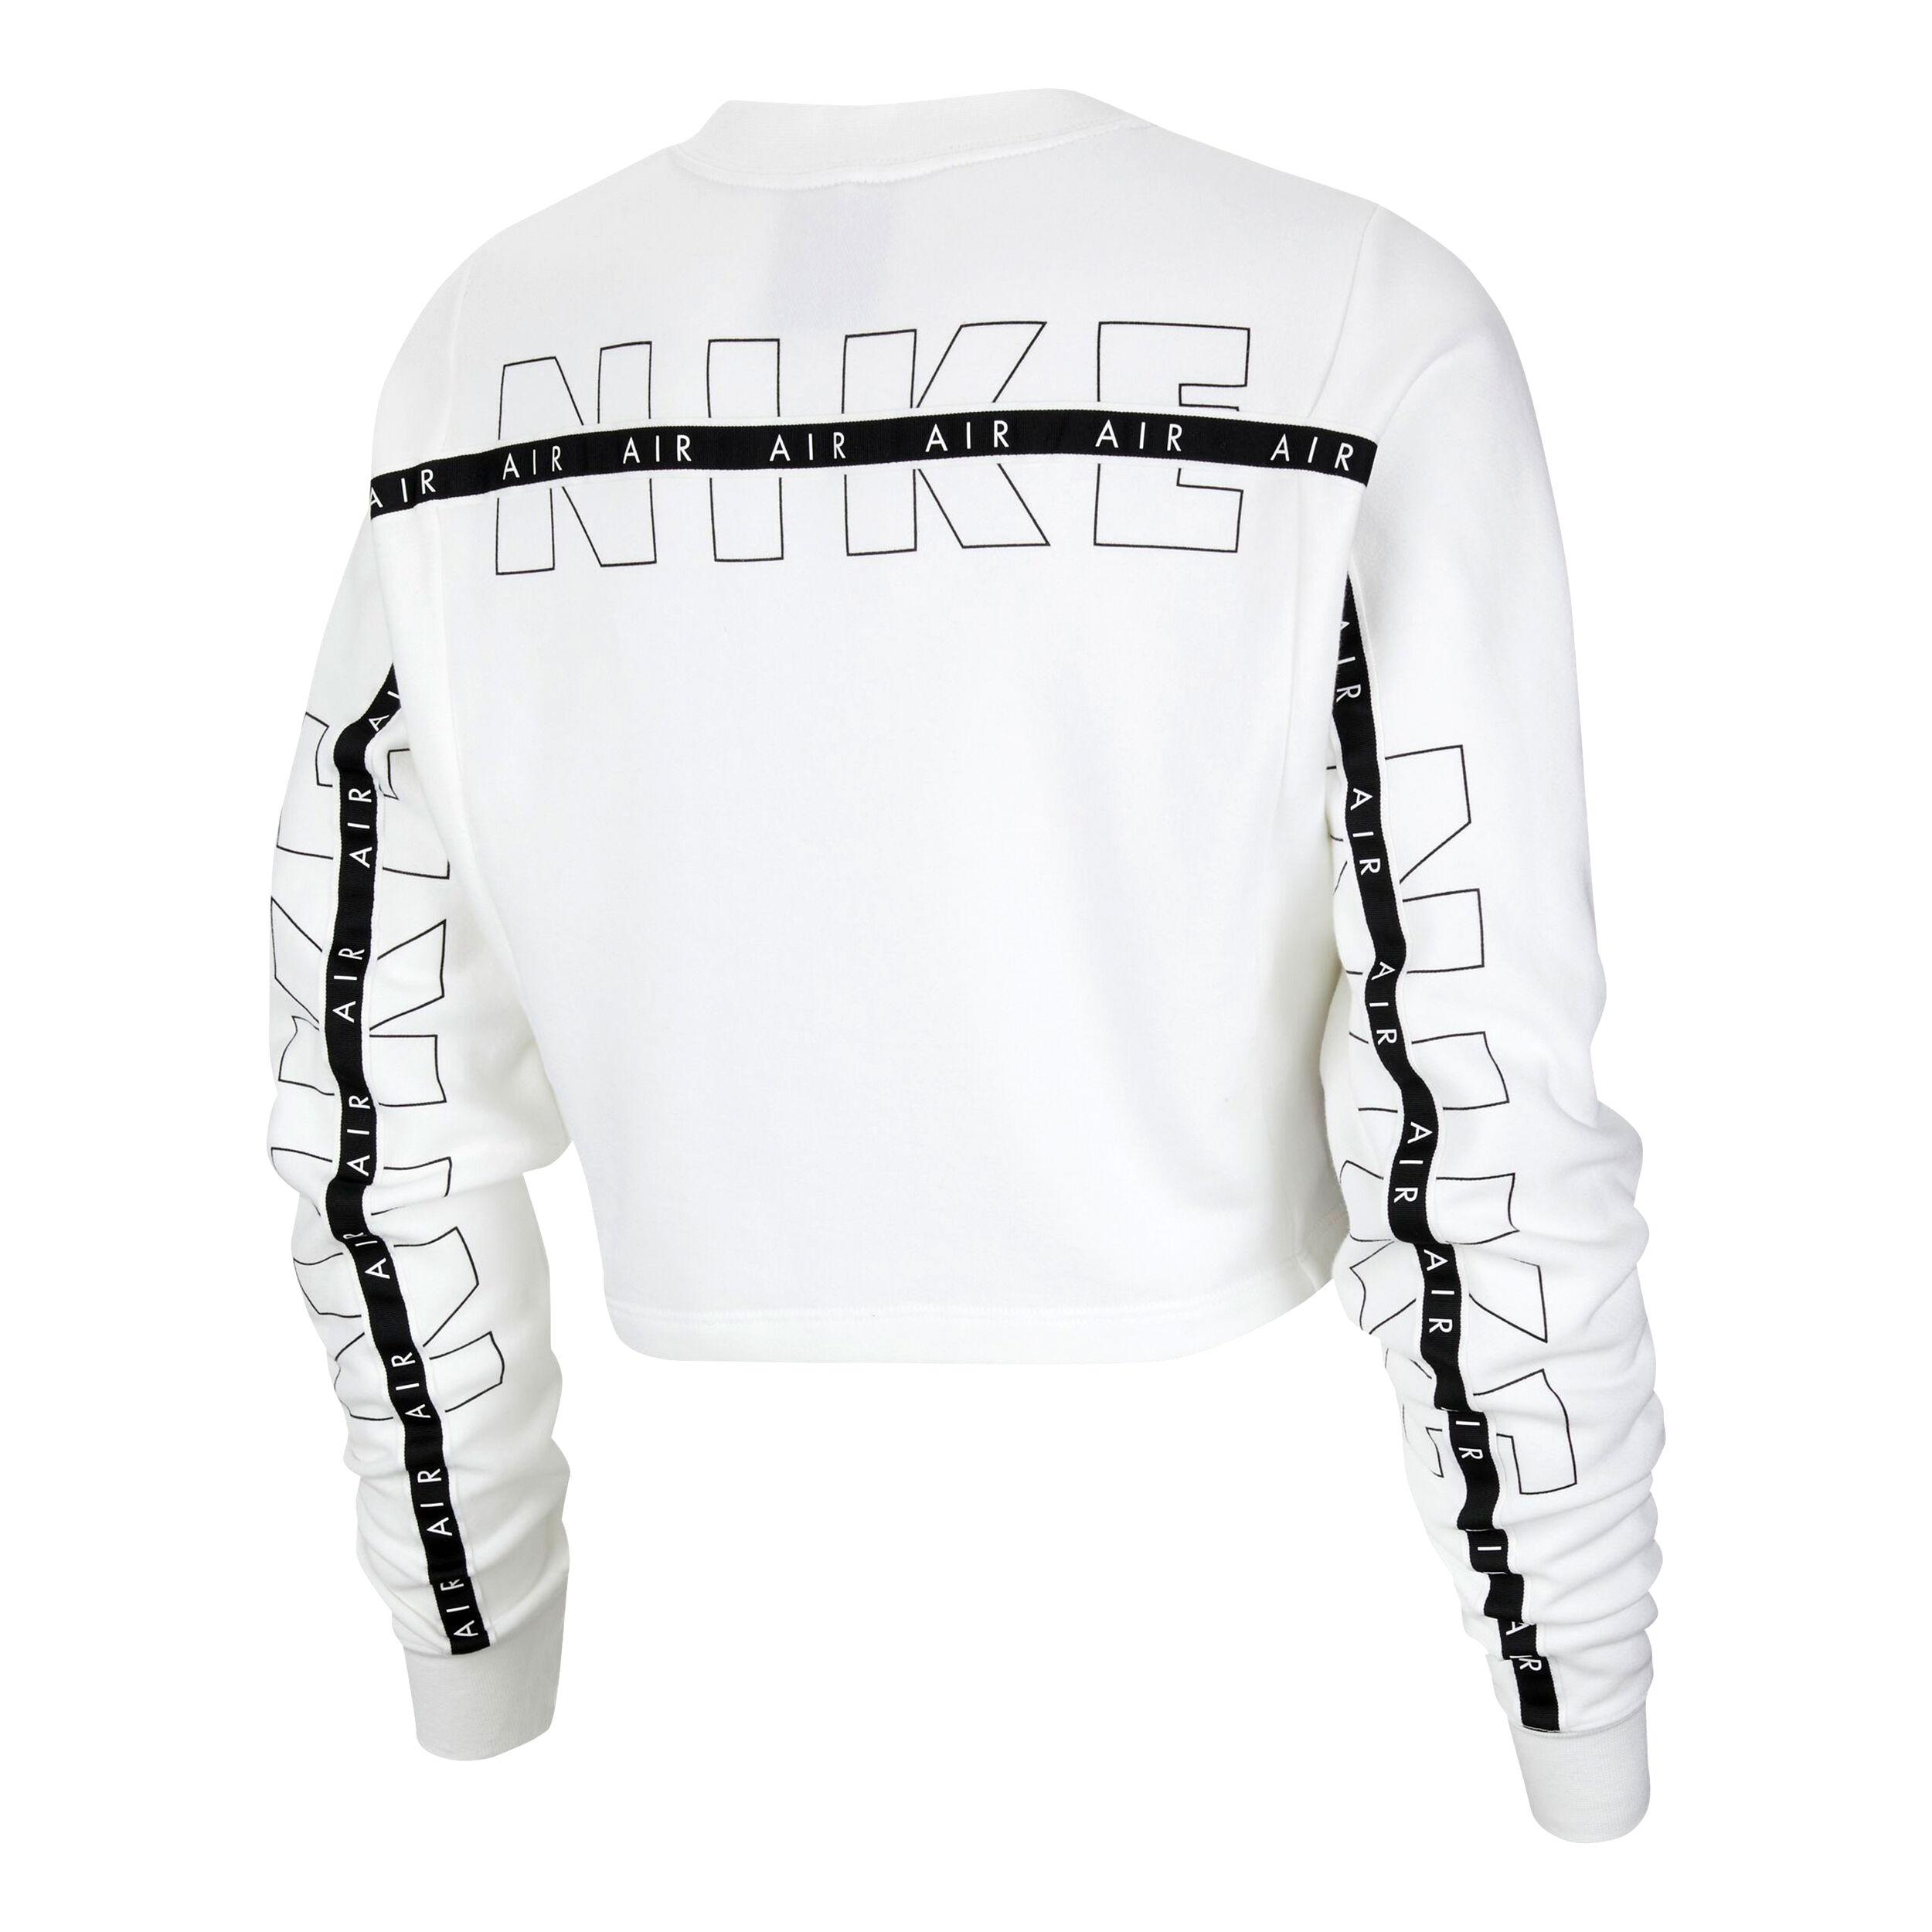 Nike Air Sportswear Tröja Damer Svart, Vit köp online